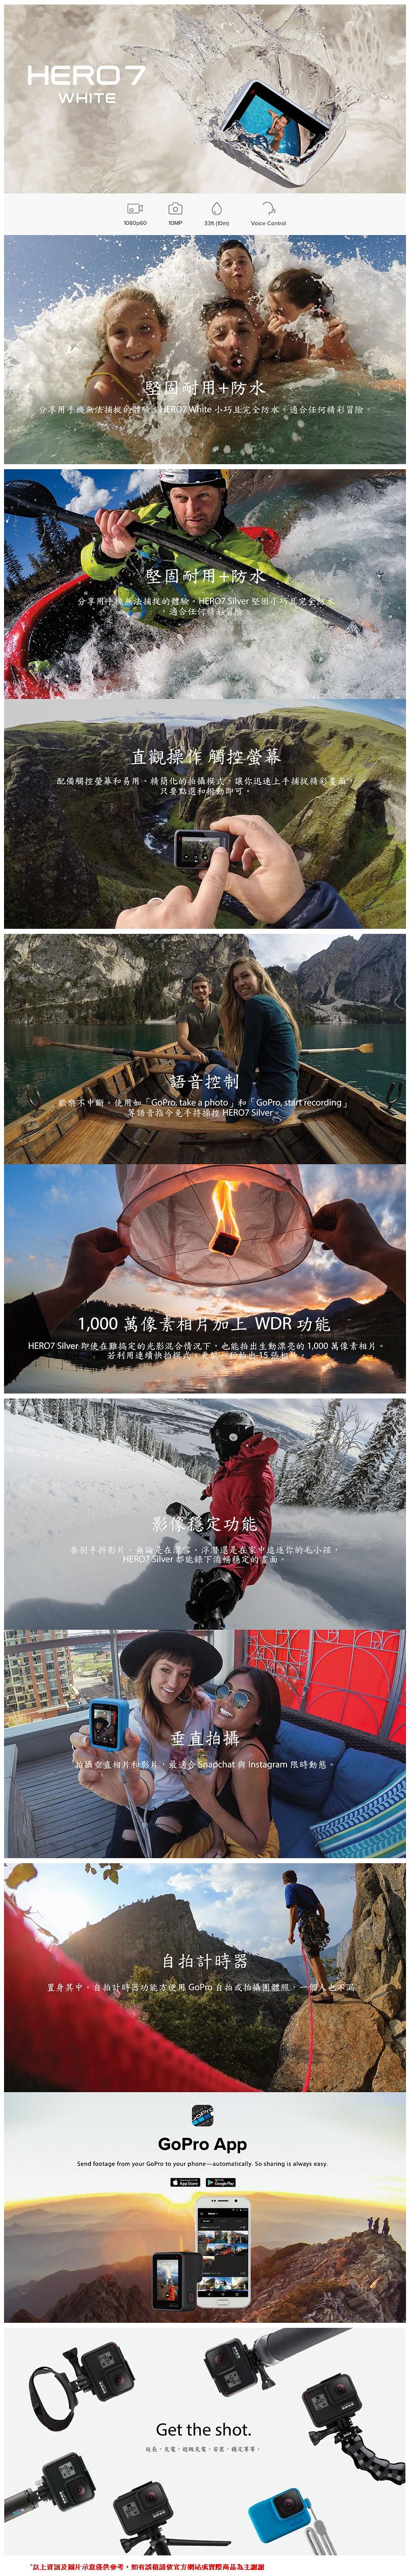 GoPro HERO7 White 全方位攝影機  公司貨  - PChome 24h購物